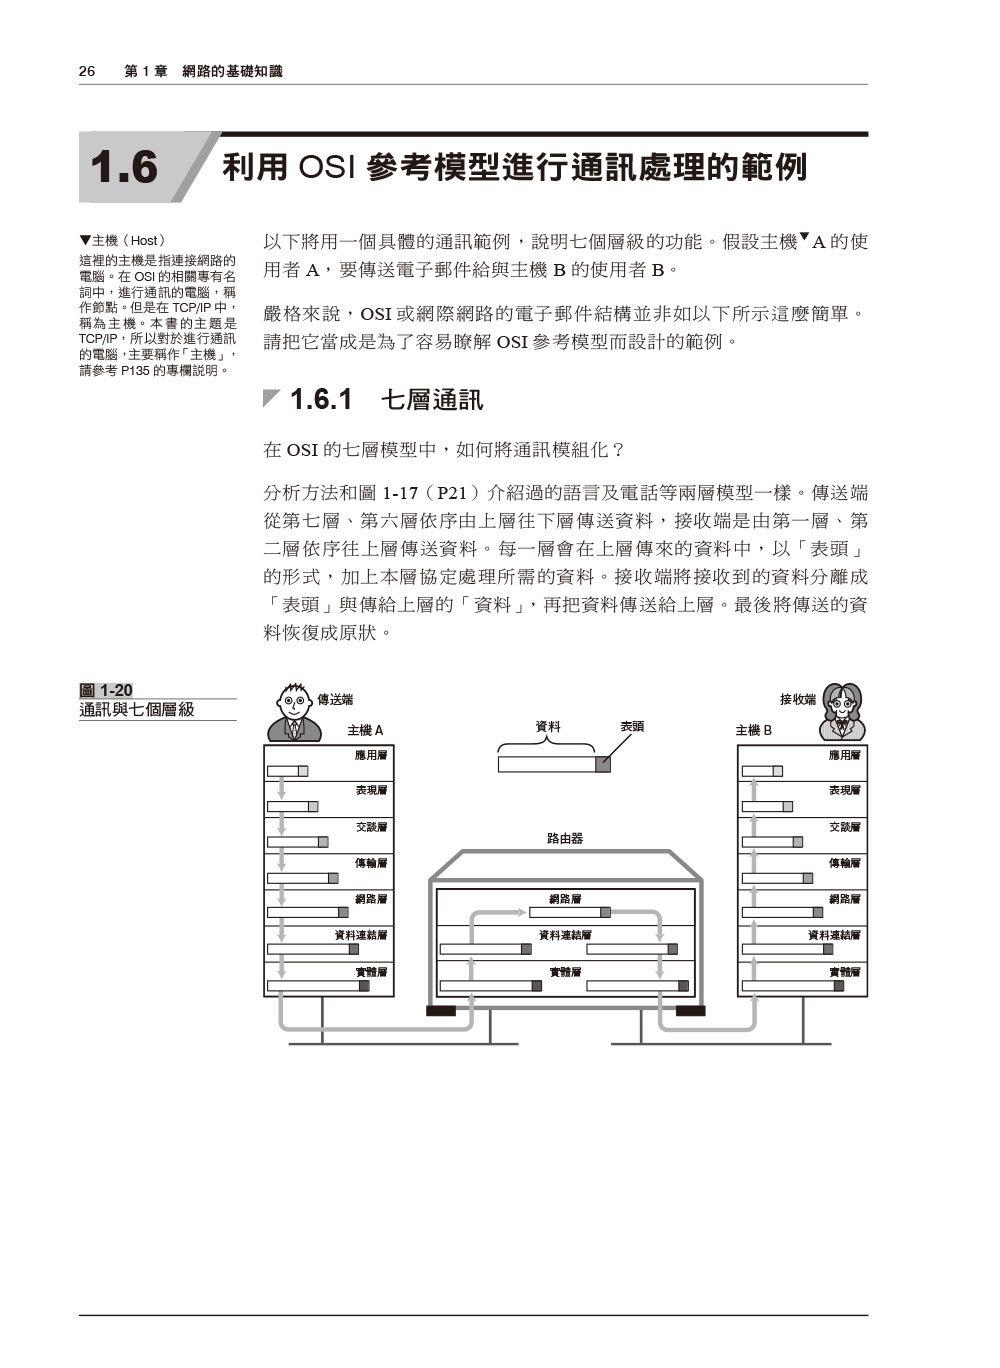 圖解 TCP/IP 網路通訊協定 (涵蓋IPv6)-preview-2